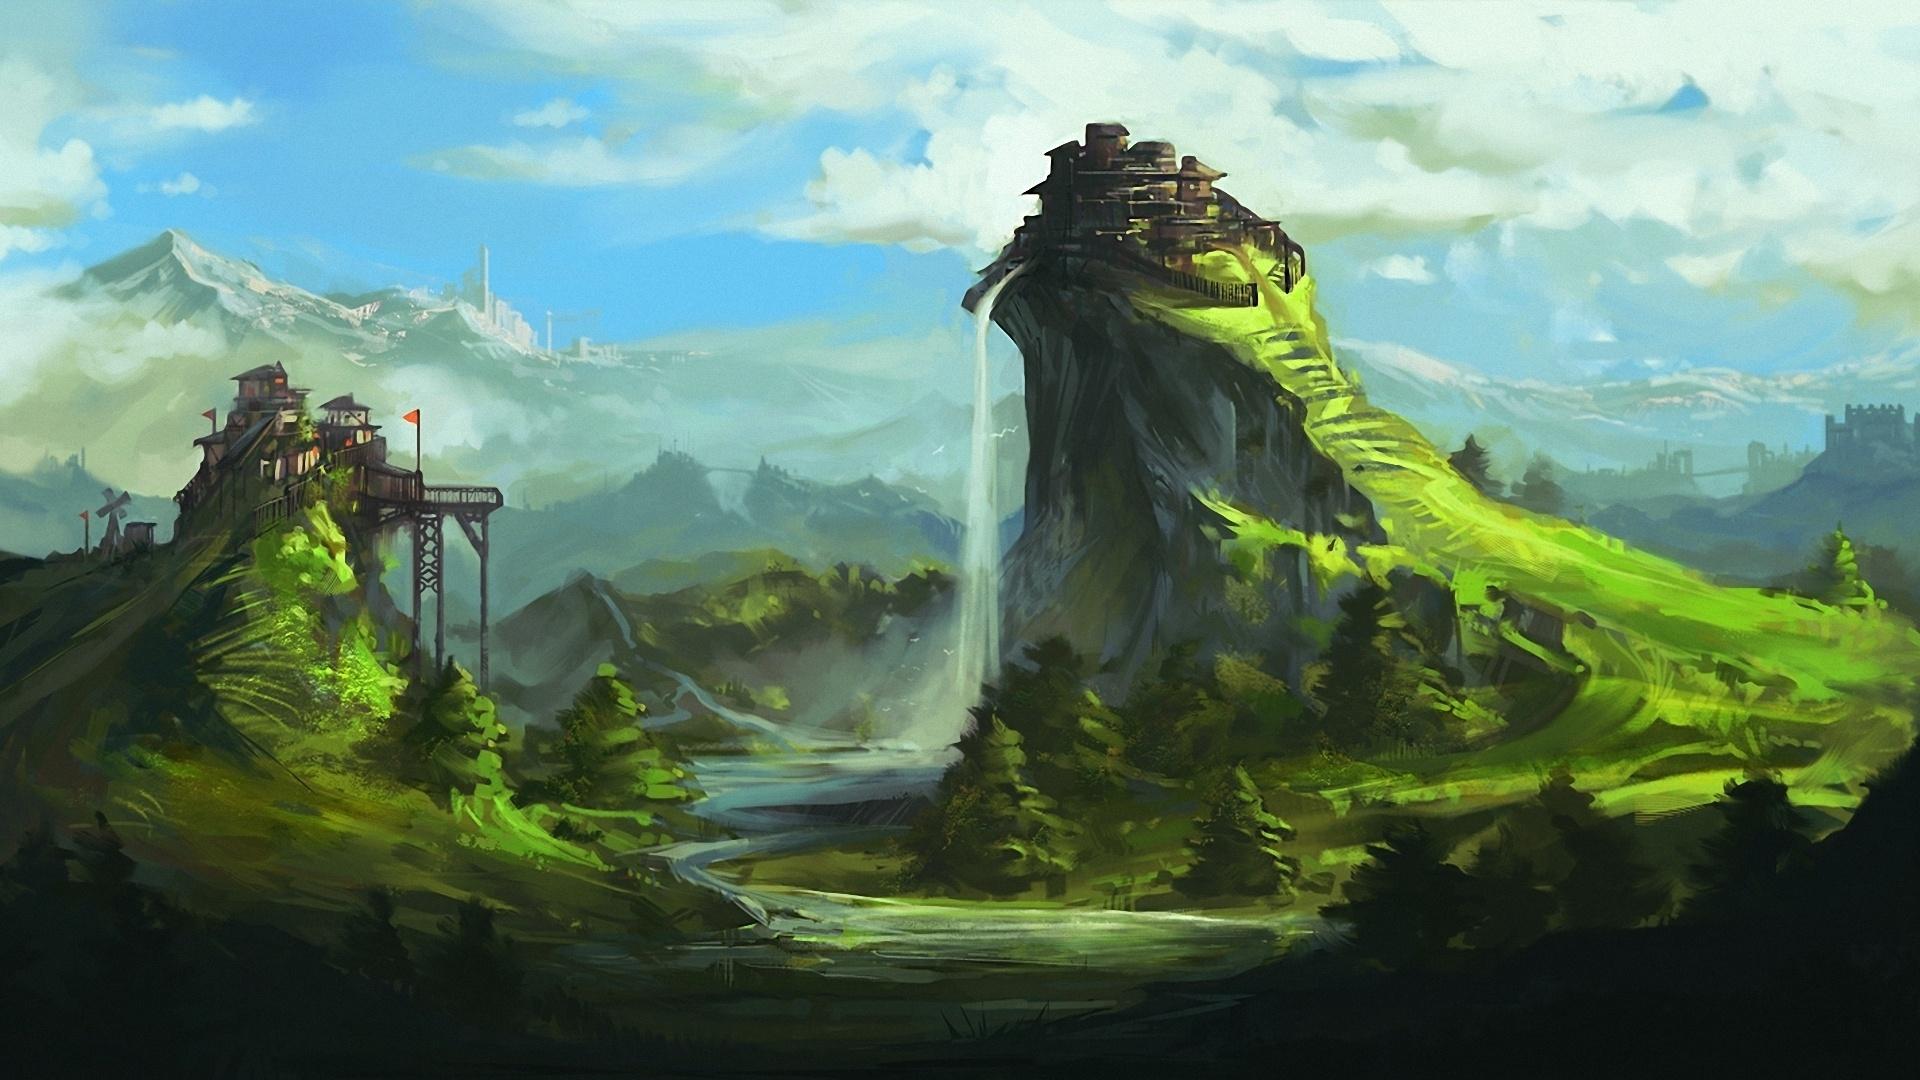 Fantasy Landsсape Free Wallpaper